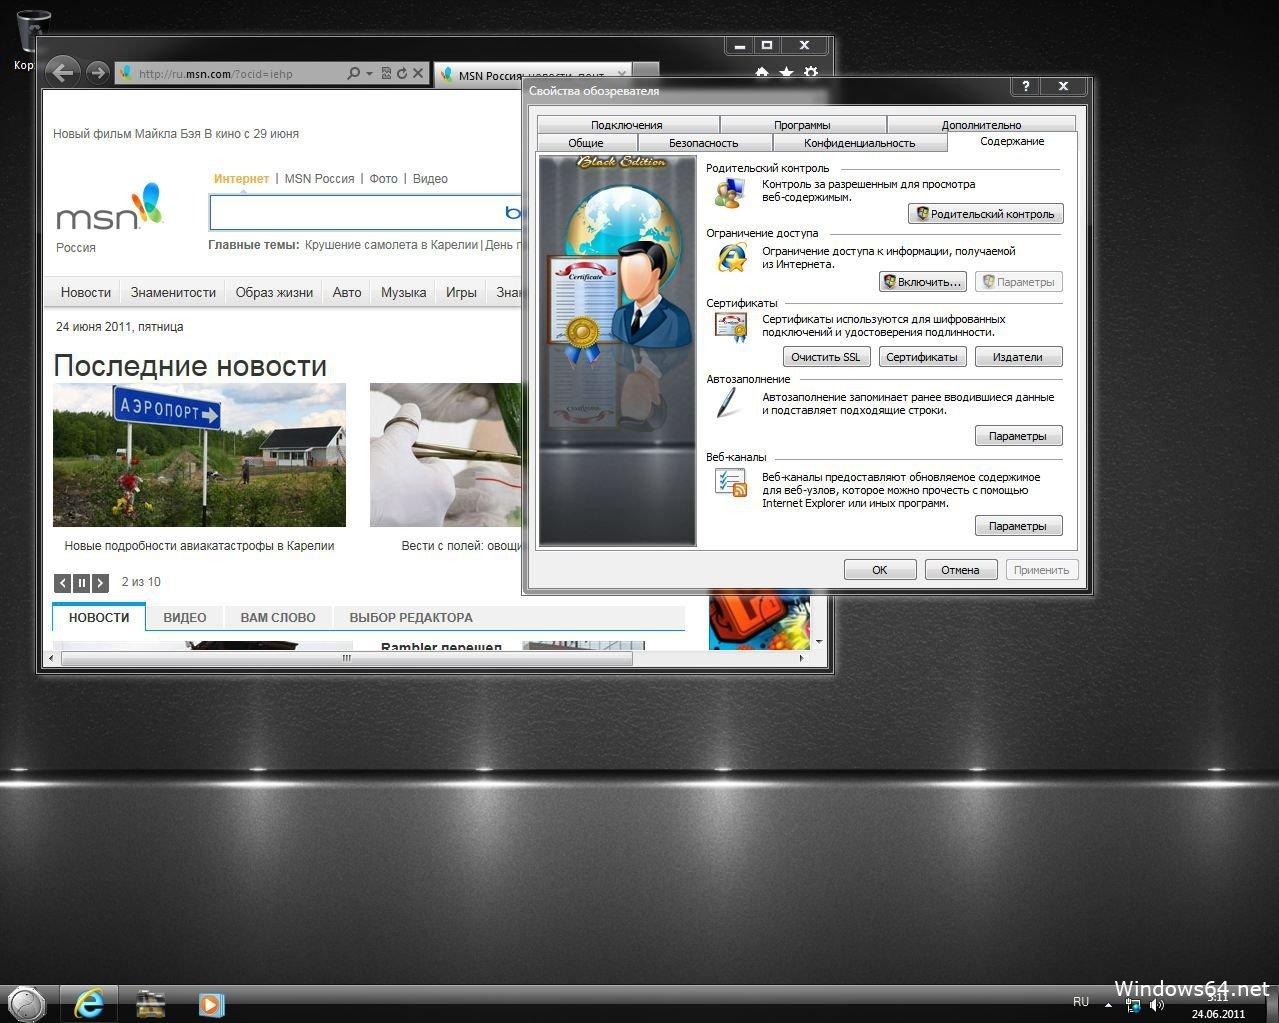 windows 7 black edition 64 bit torrent download